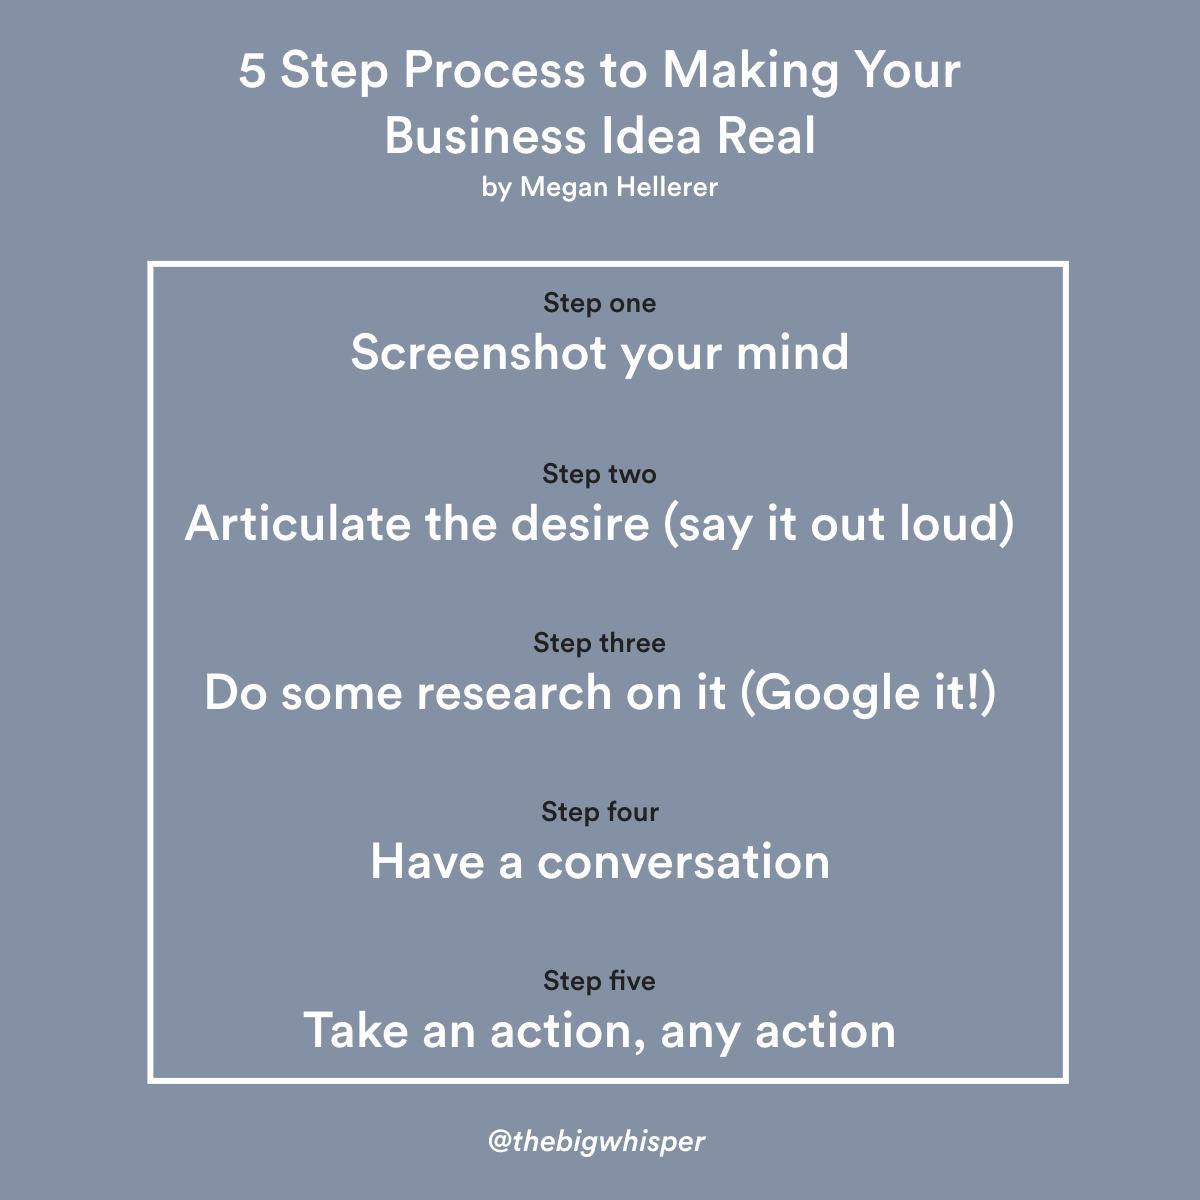 5-step-process-making-business-idea-real.001.jpeg